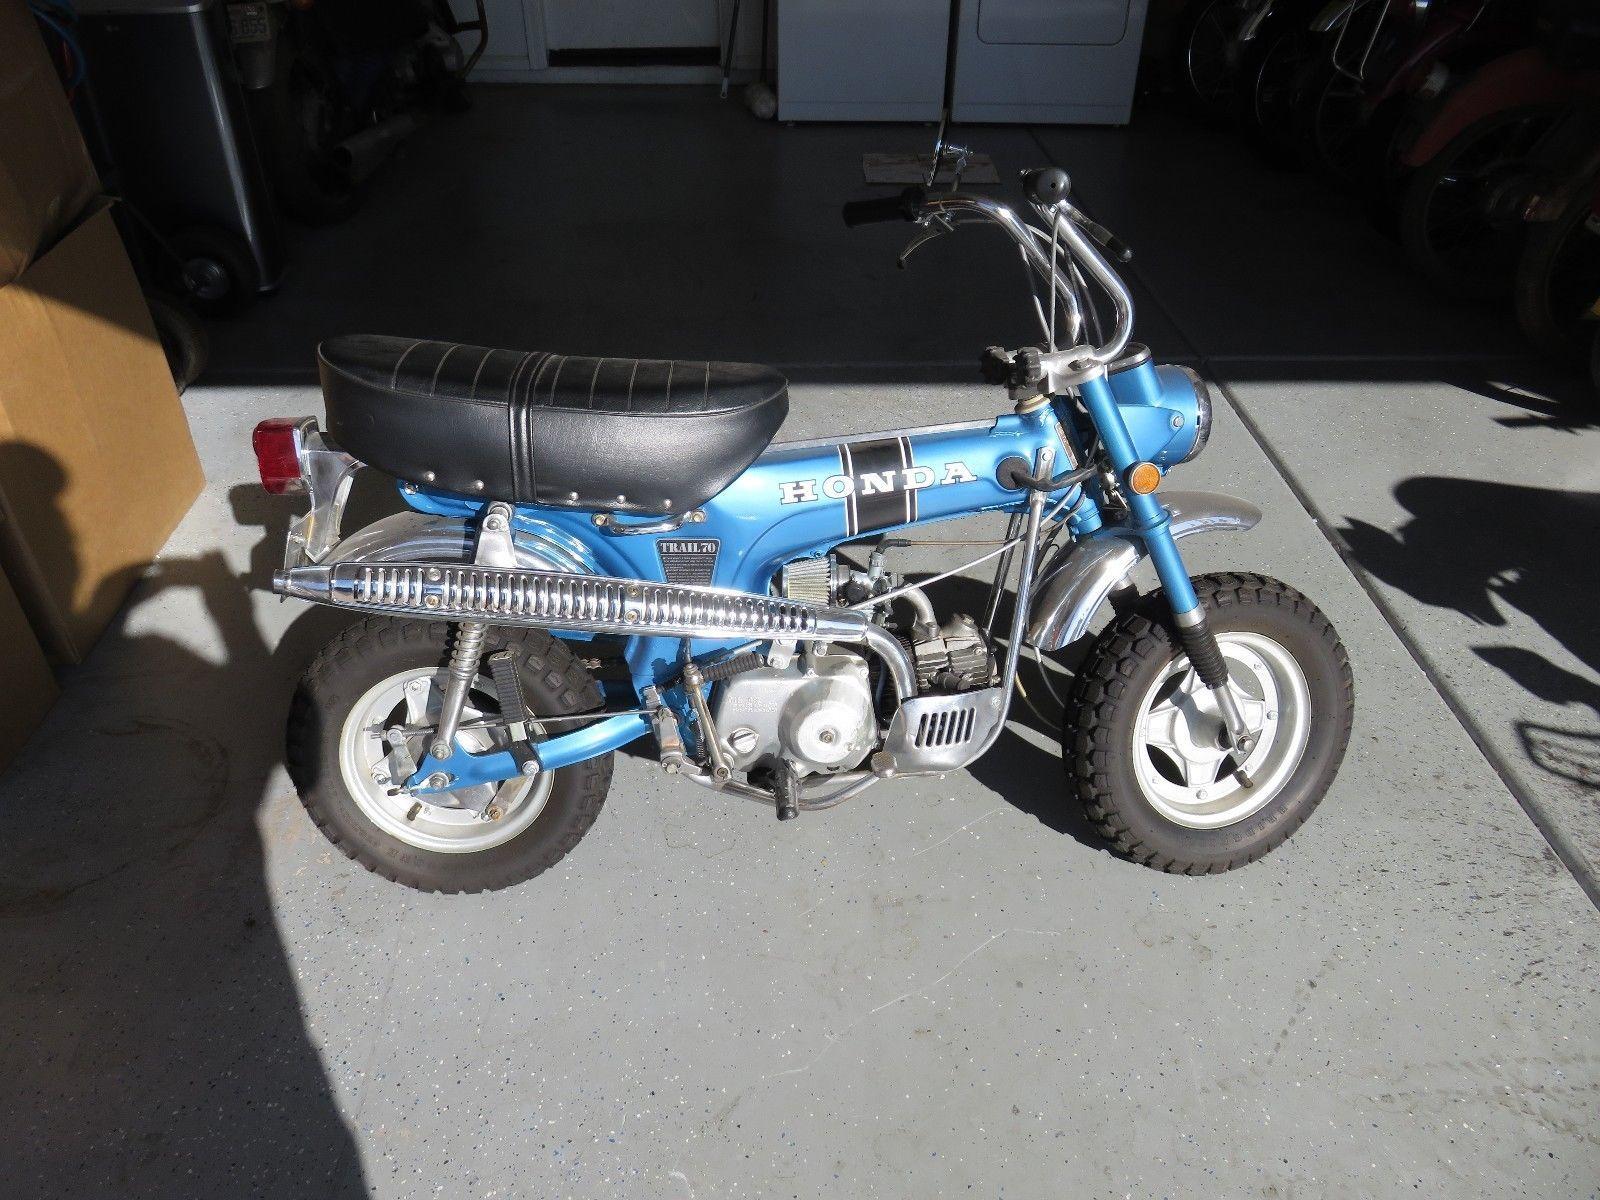 1970 Honda Ct 70 Us Classic Bike Pinterest And Bikes Ct70 Fuel Tank Ebay Blue Ko Model 3 Speed